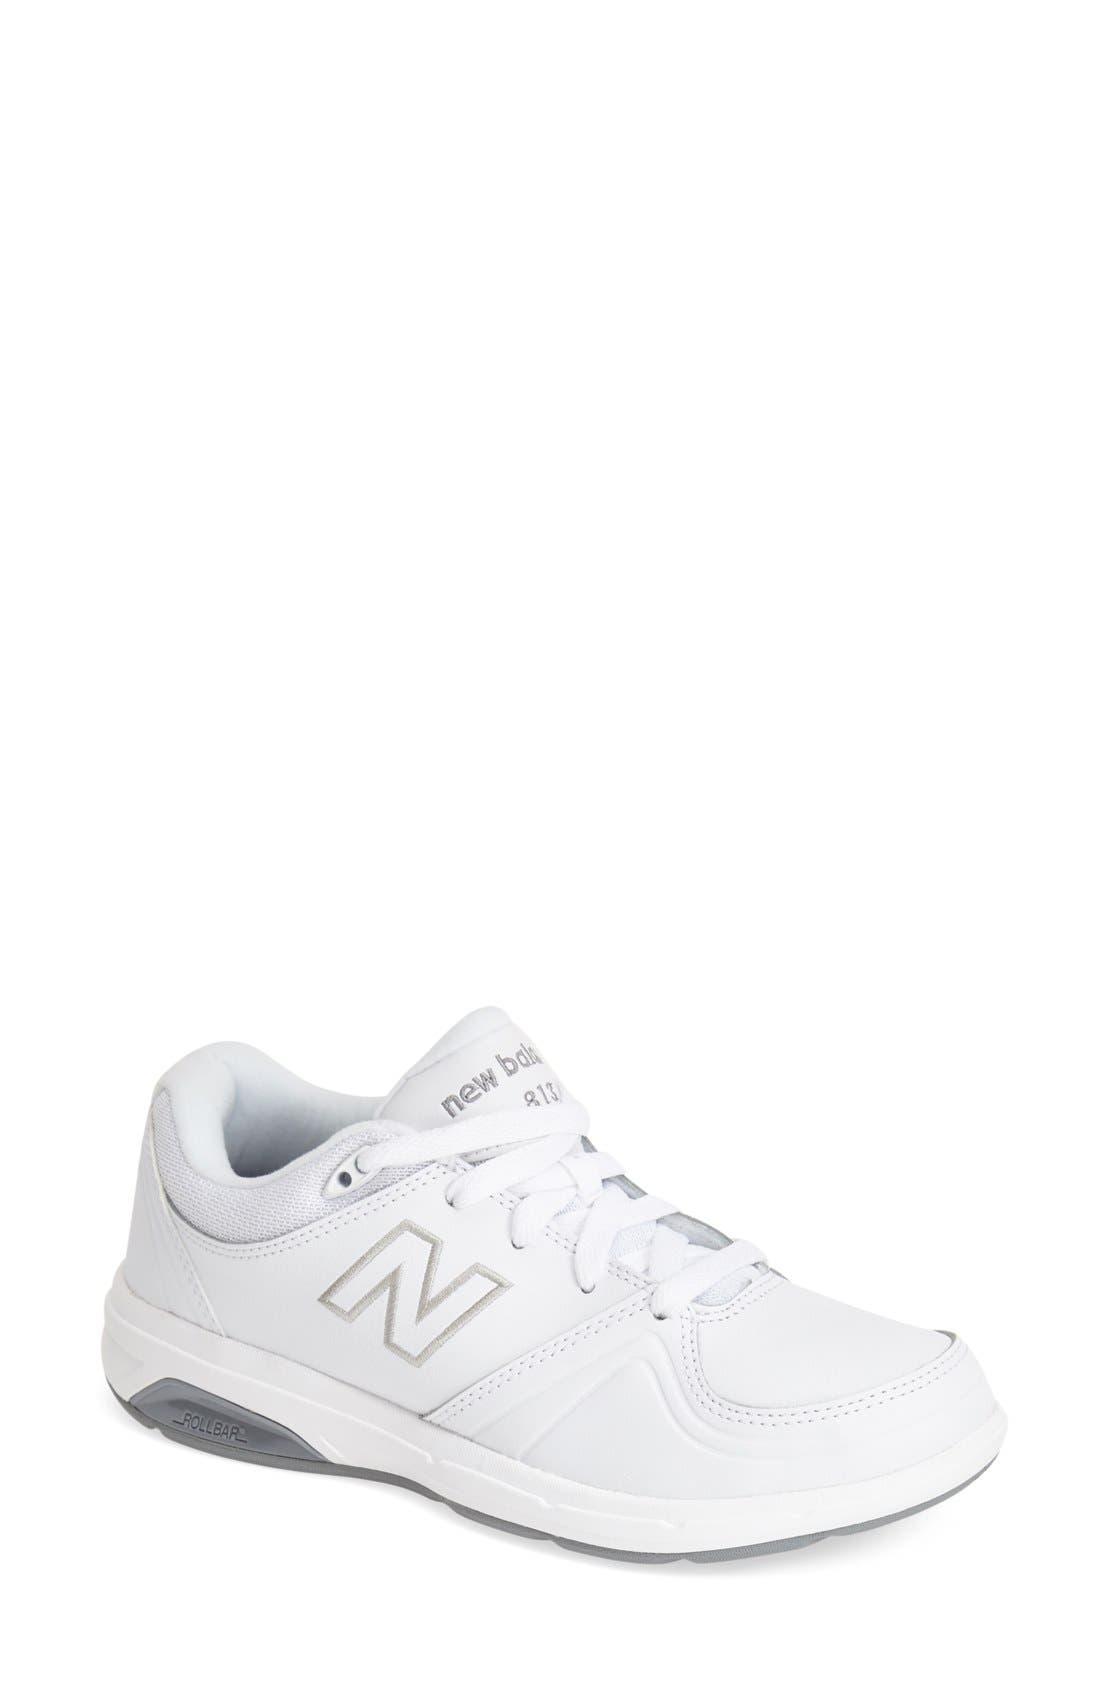 Alternate Image 1 Selected - New Balance '813' Walking Shoe (Women)